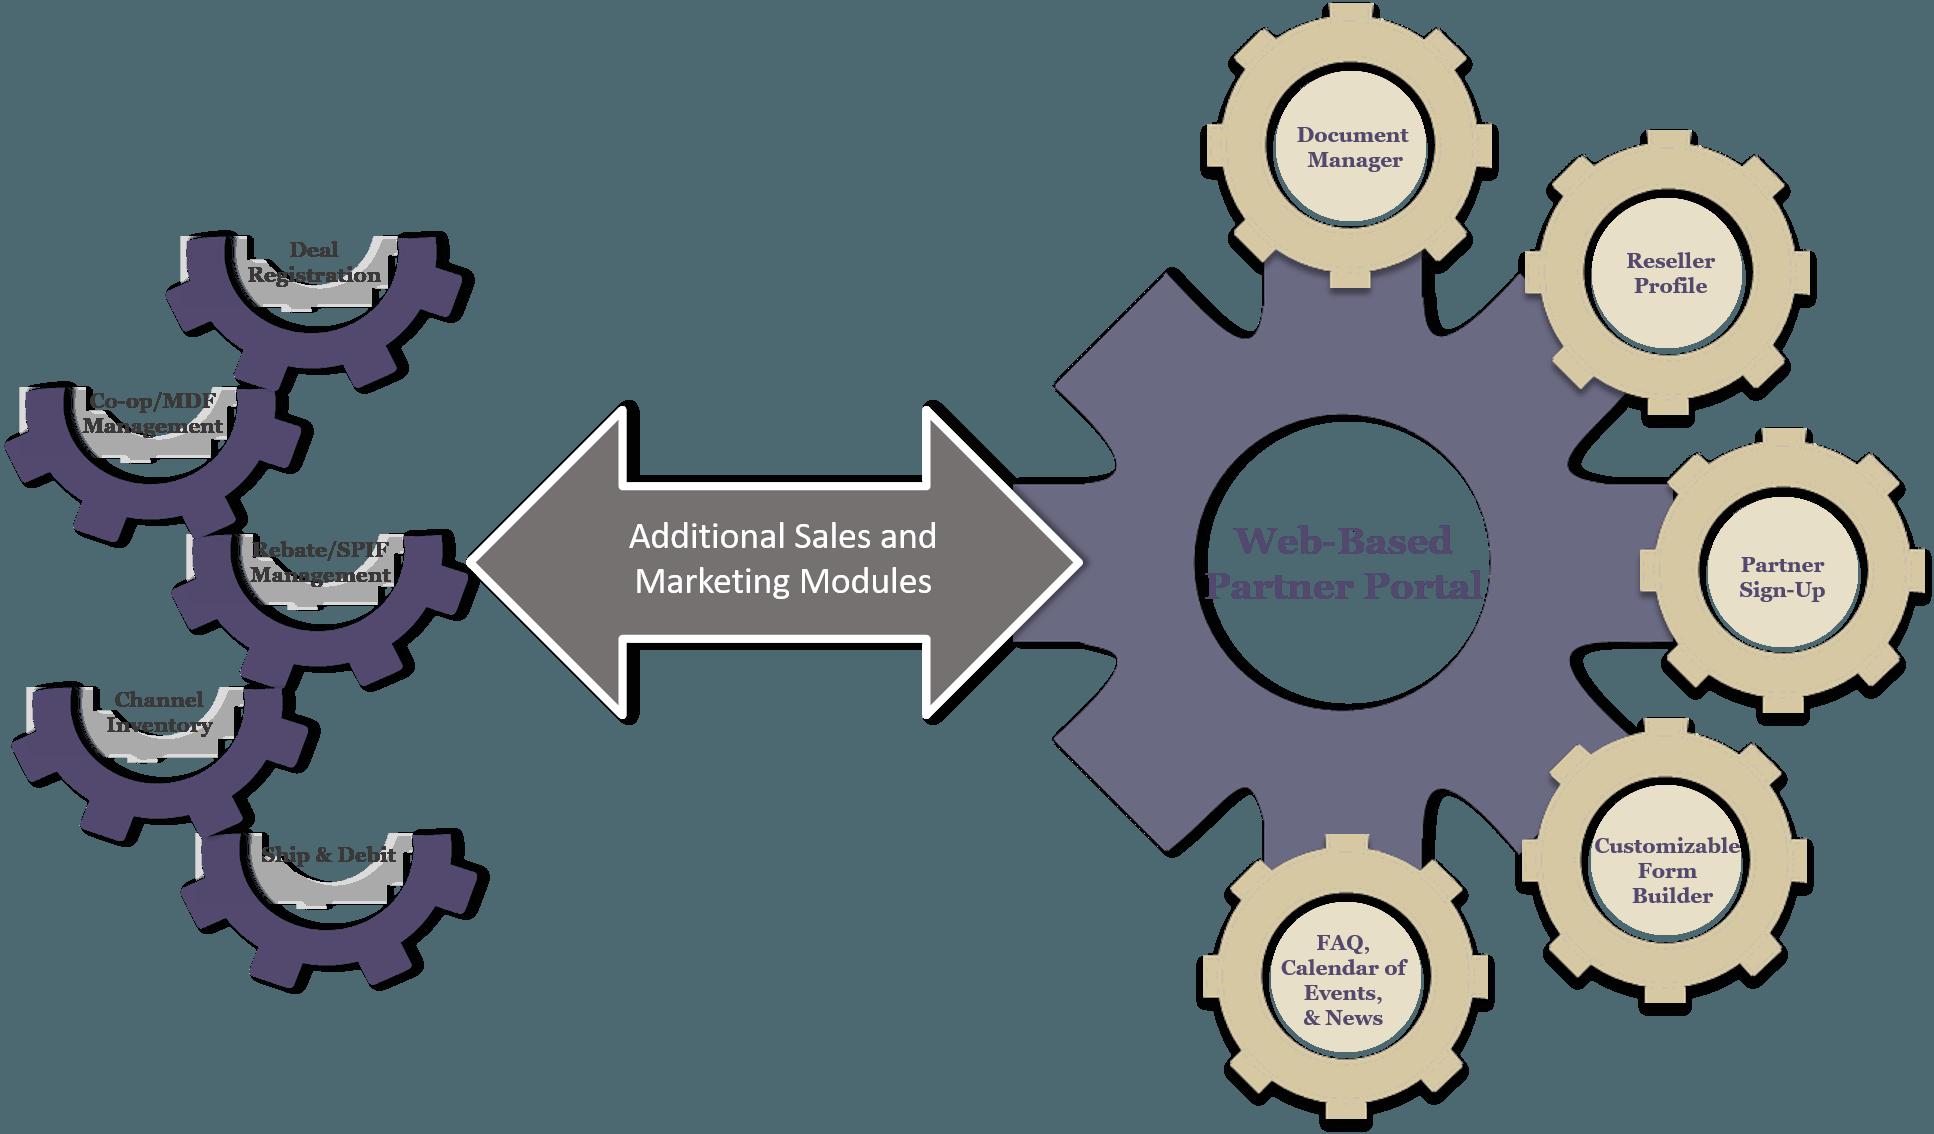 Web Based Partner Portal